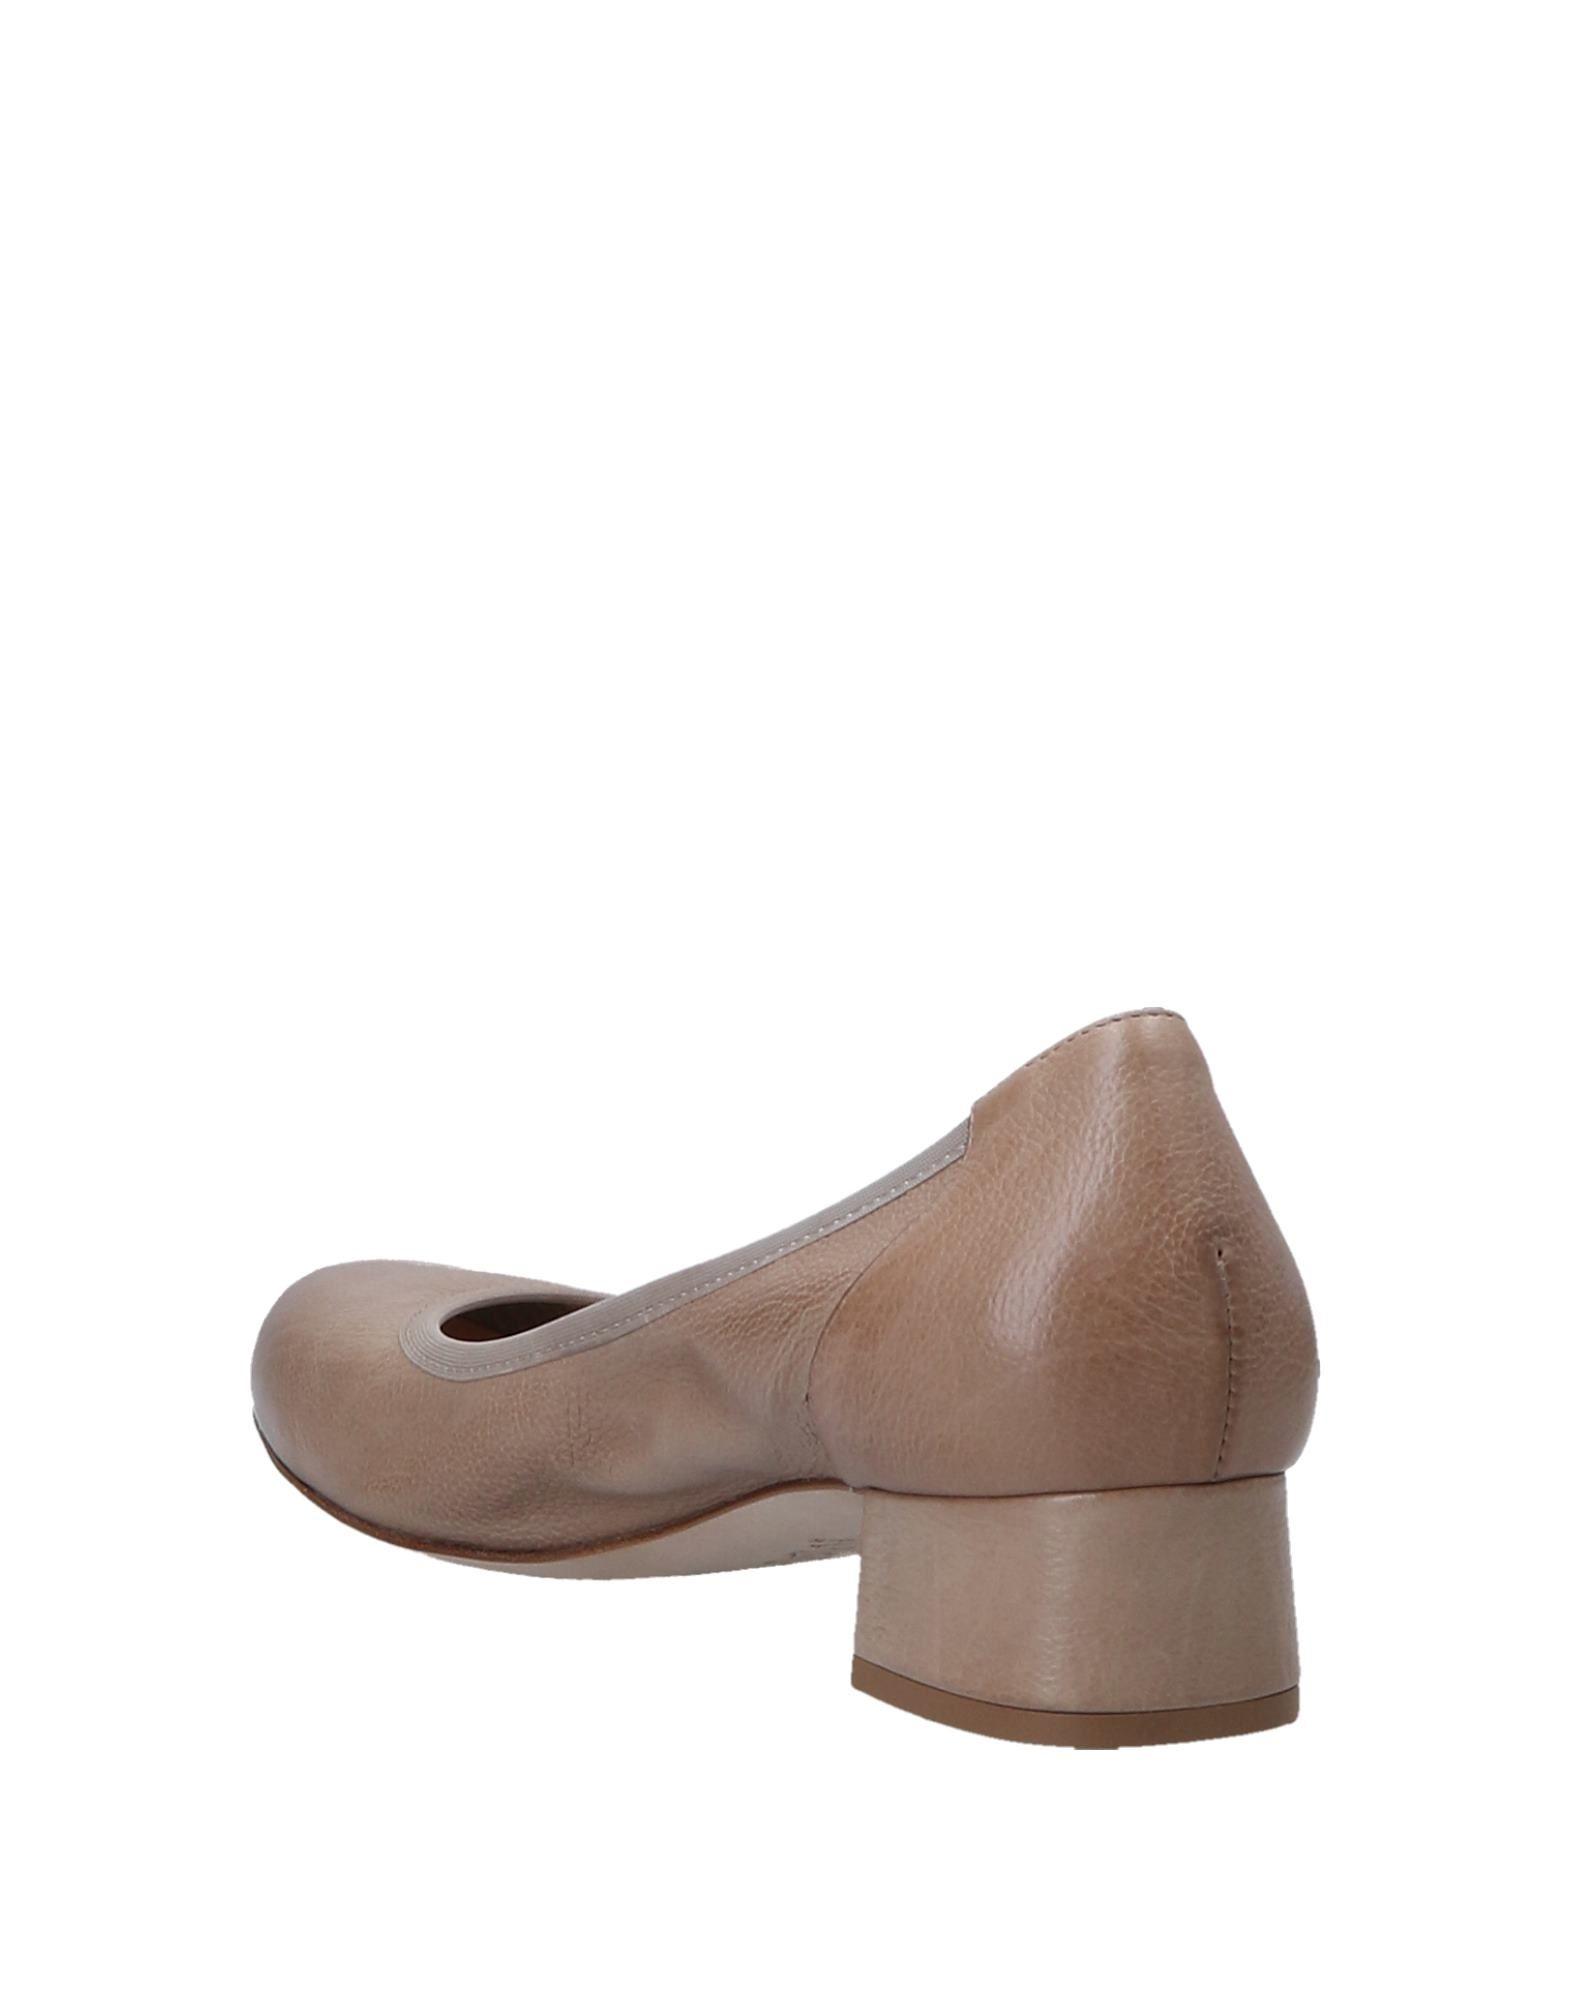 Calpierre Pumps Damen  Schuhe 11551379XD Gute Qualität beliebte Schuhe  ef68be